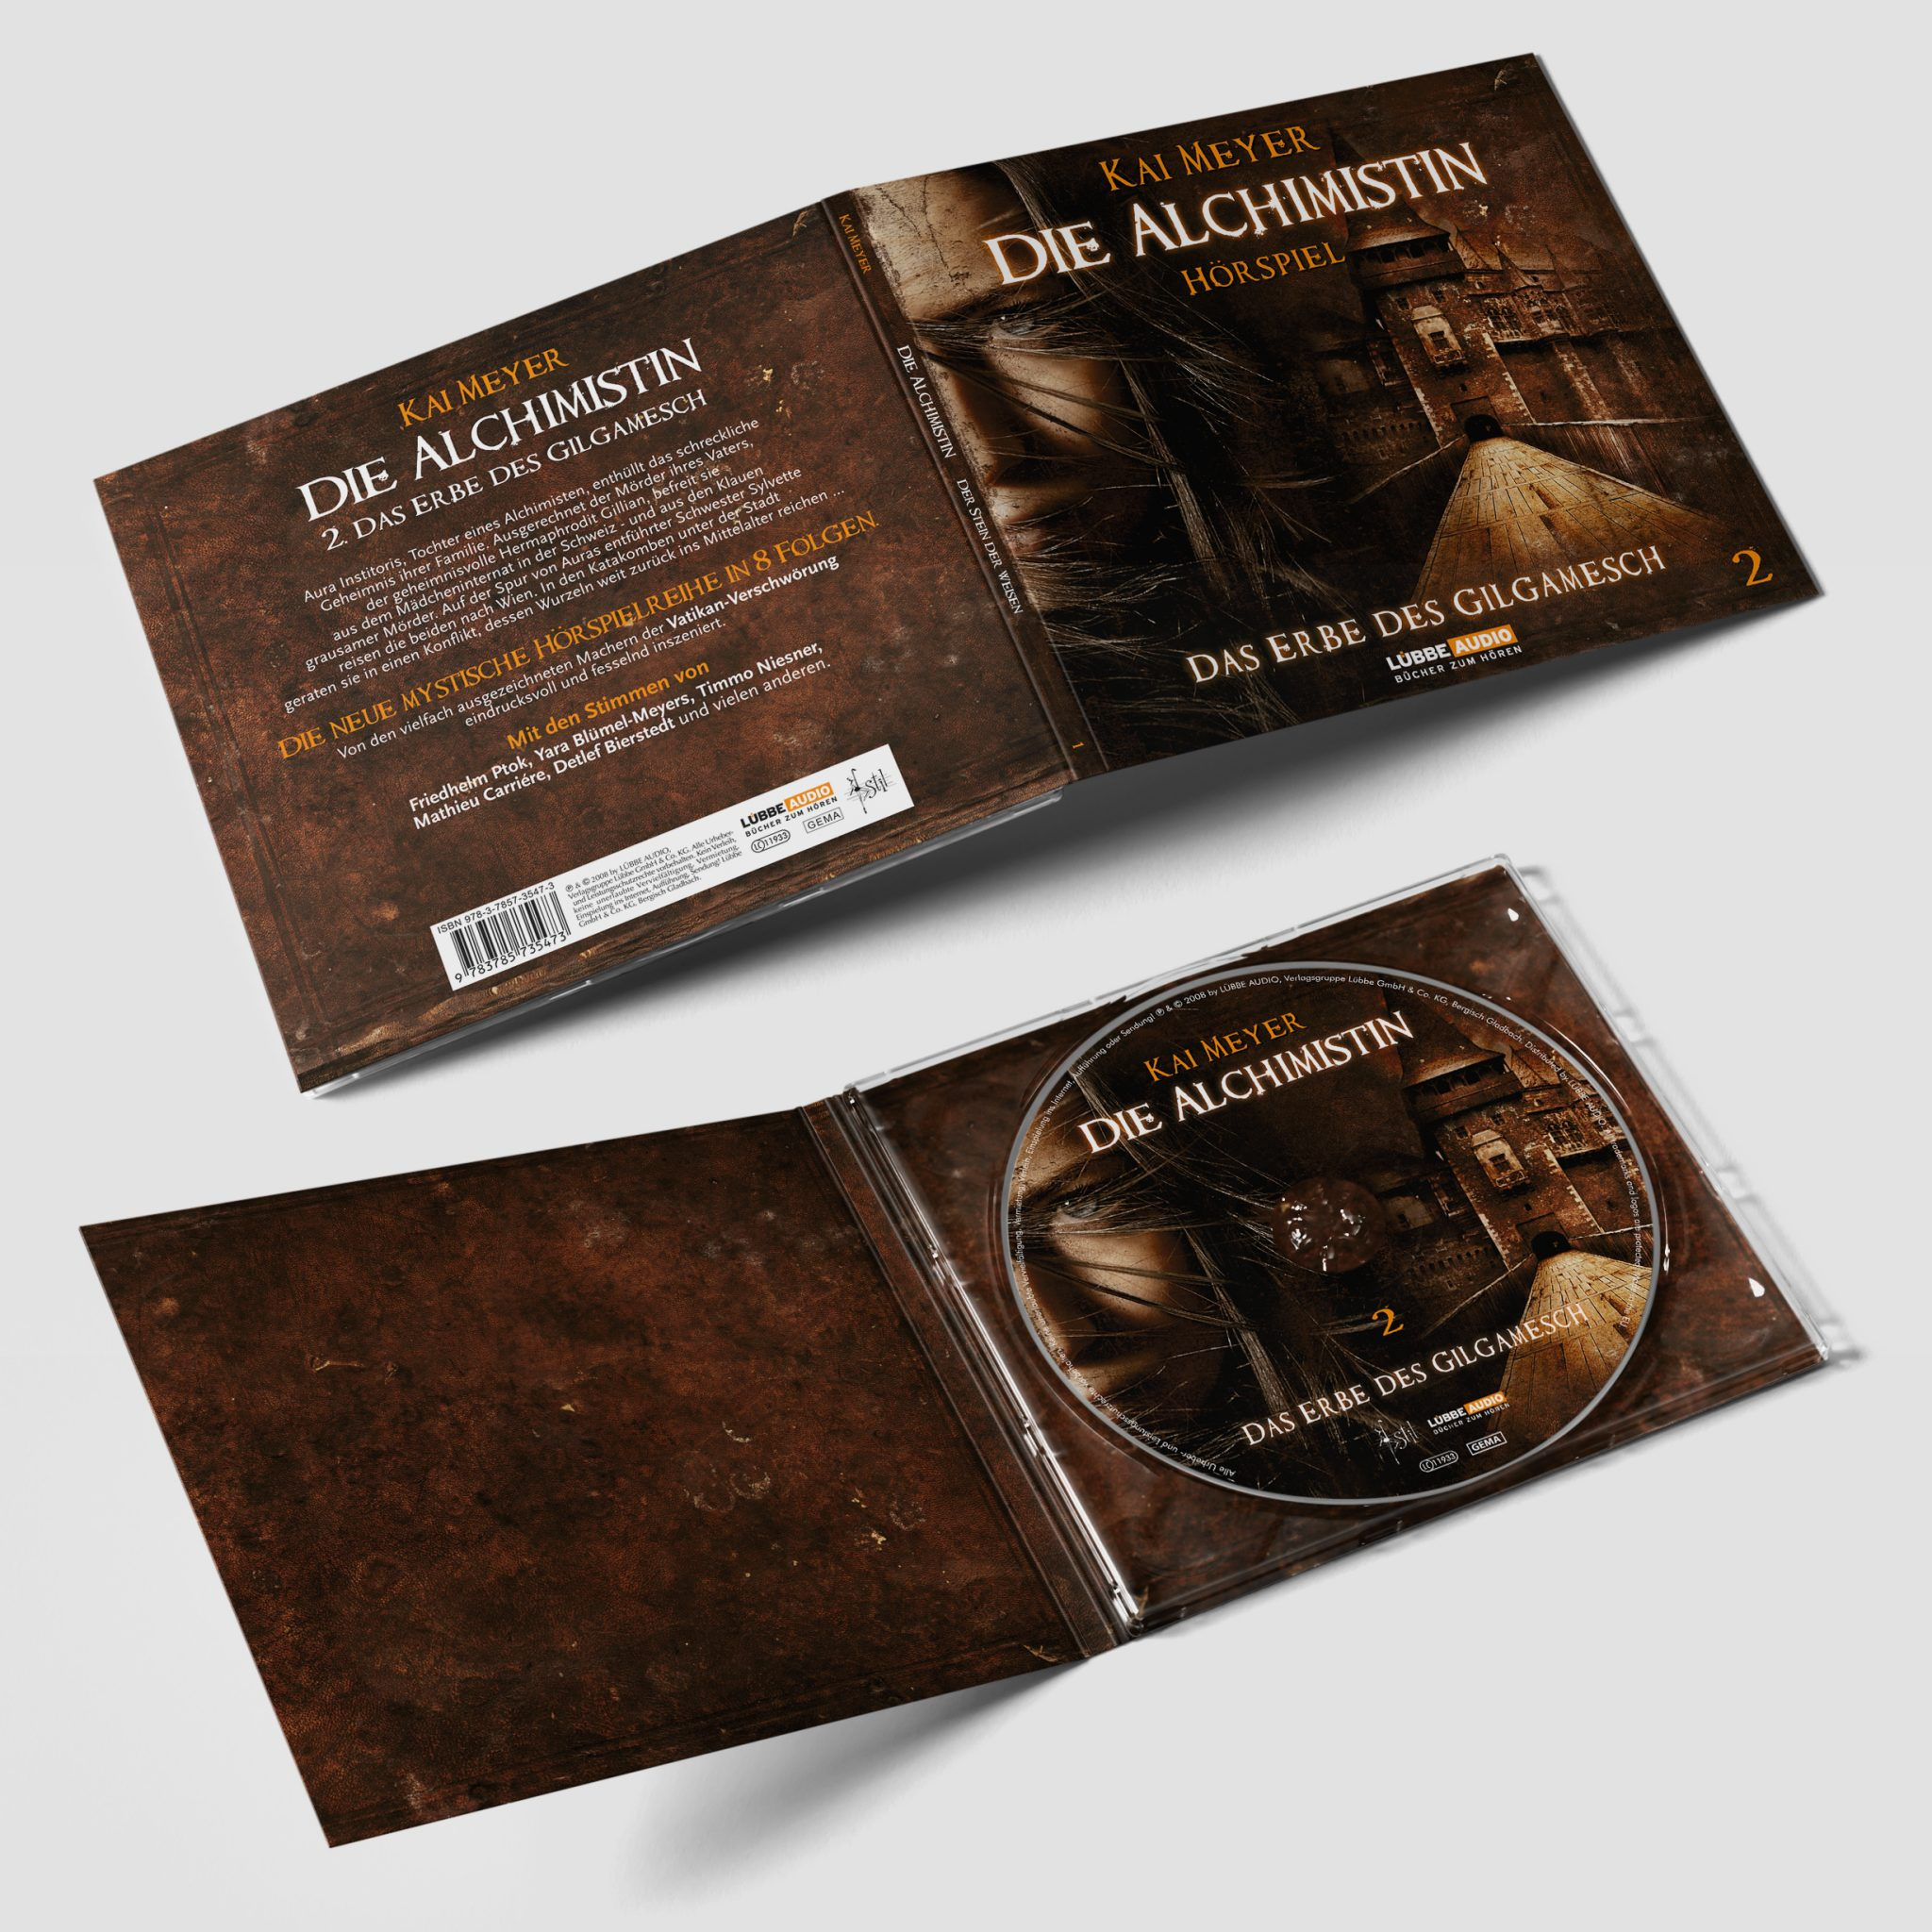 die alchimistin_luebbe-2